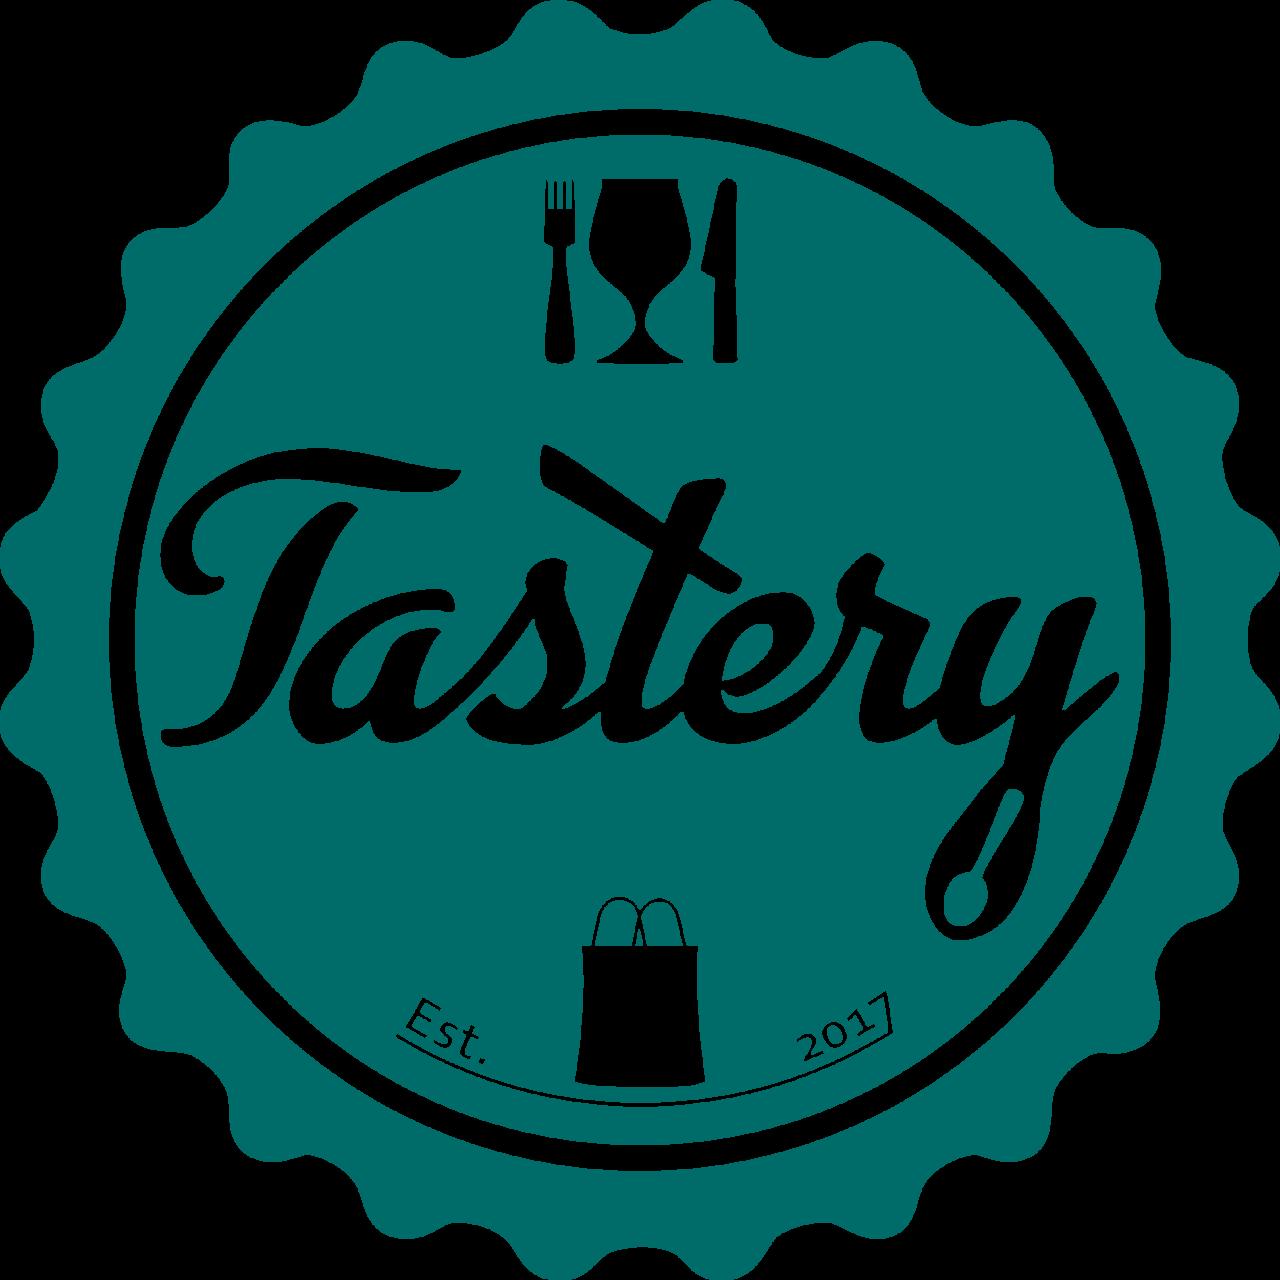 Tastery